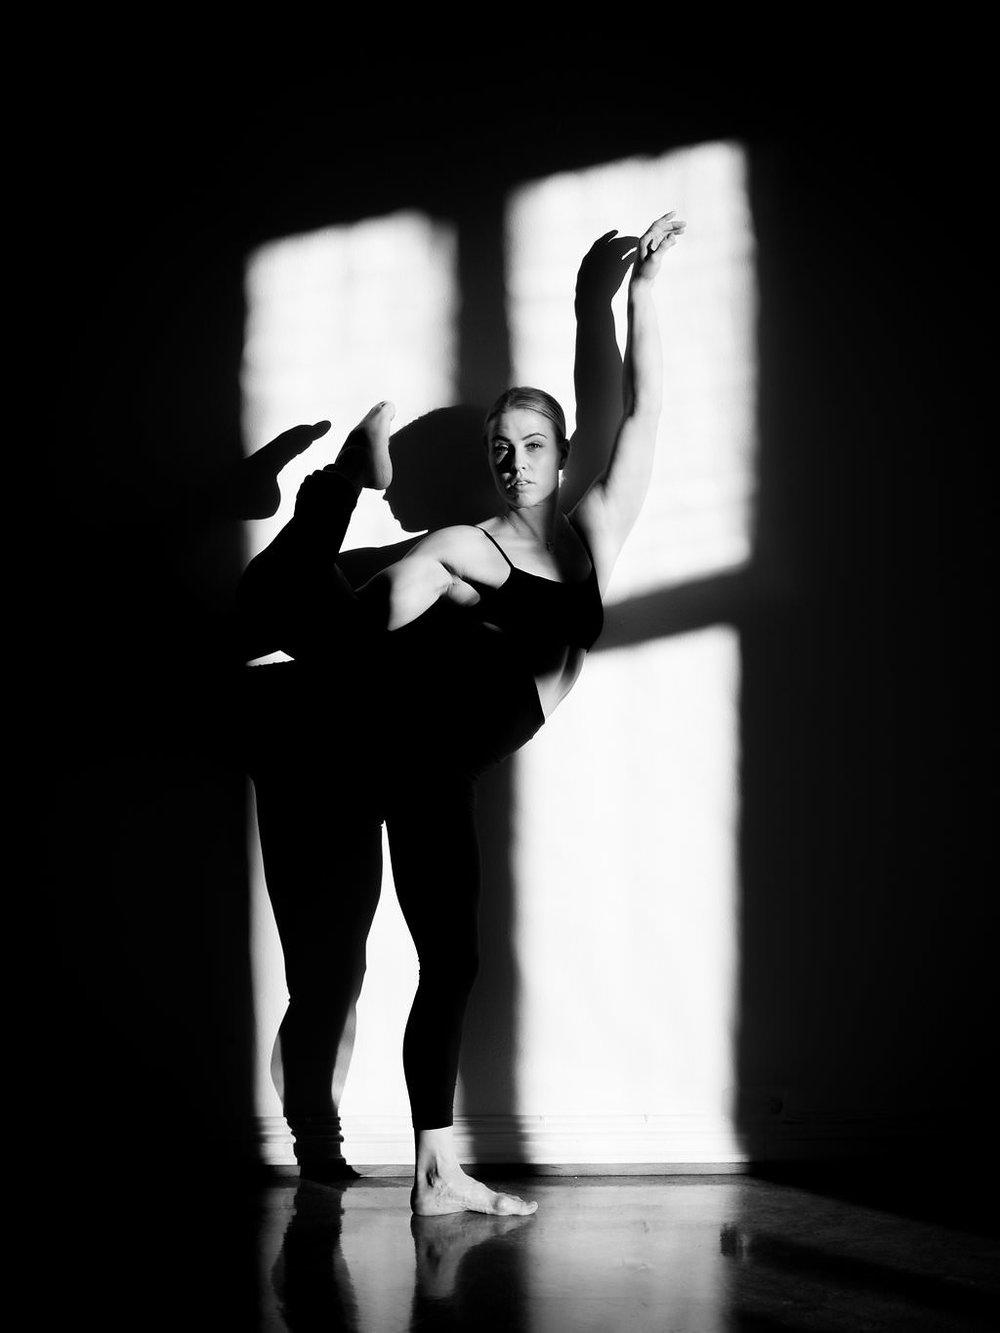 fotograf-performance-dans-pole-1.jpg